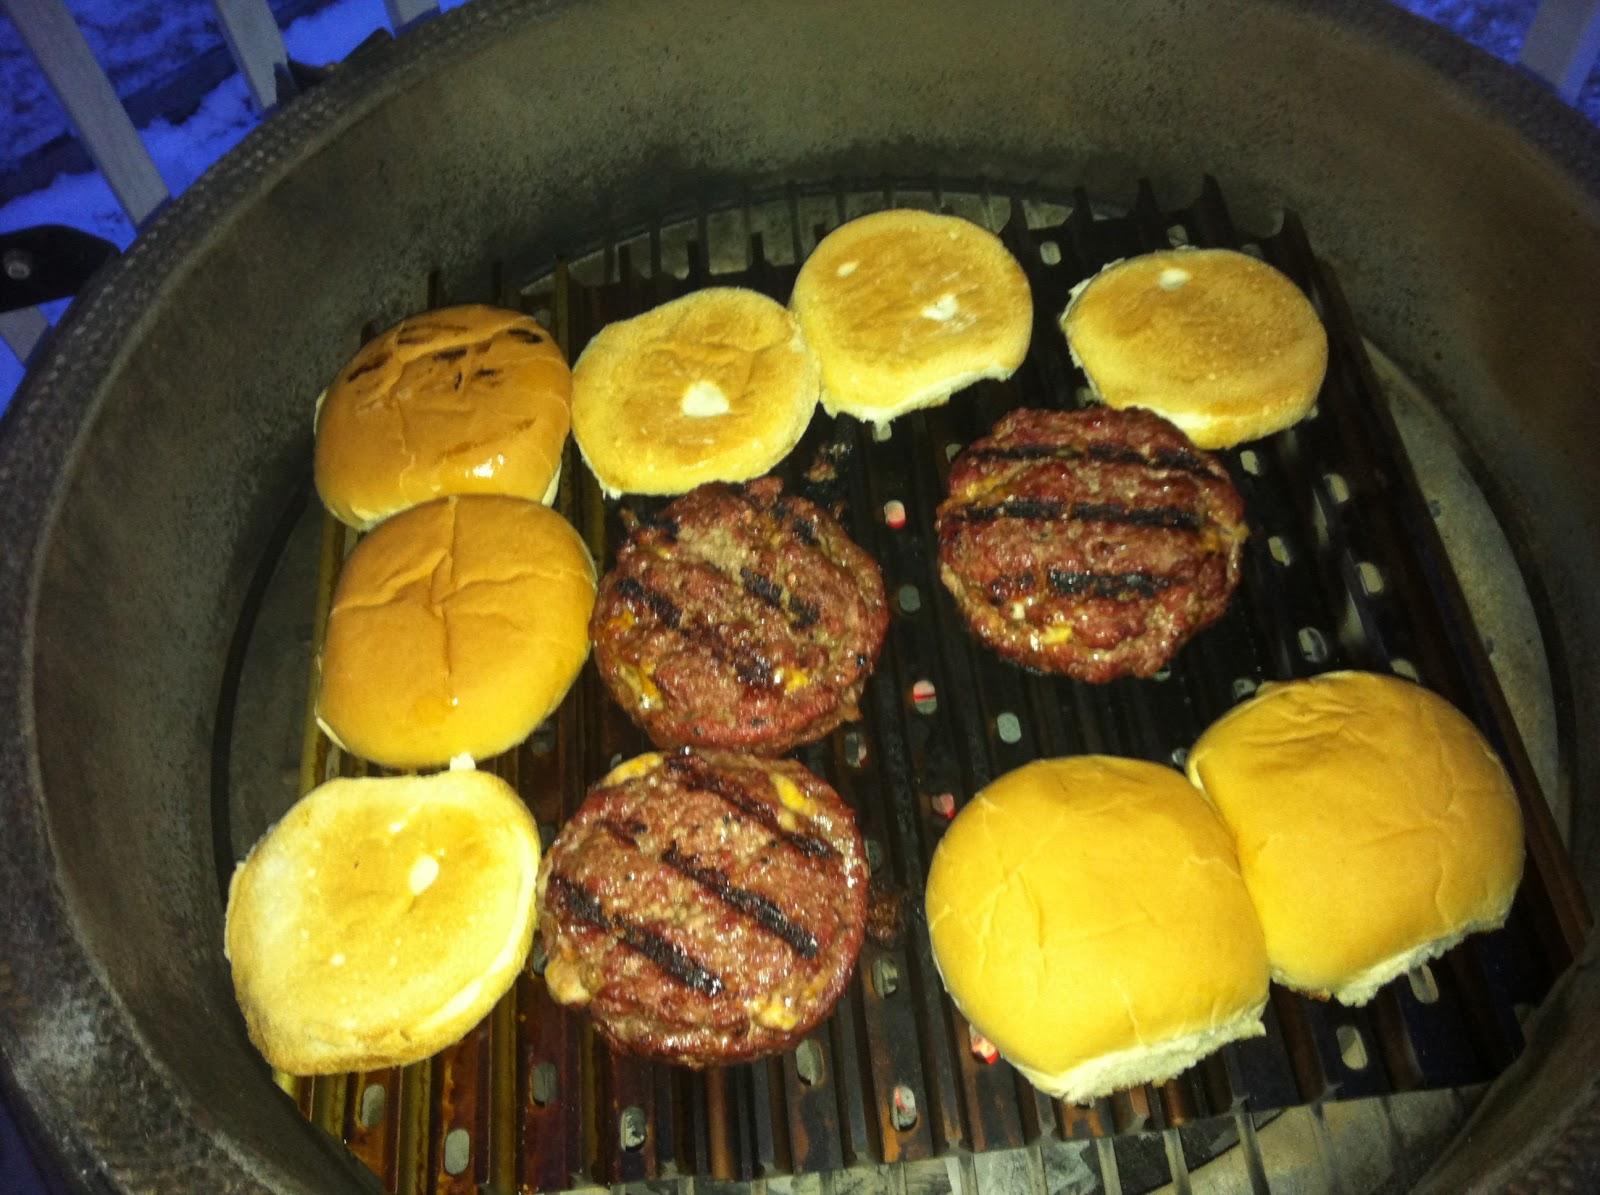 hrm creative bbq stuff hanburgers on the big green egg